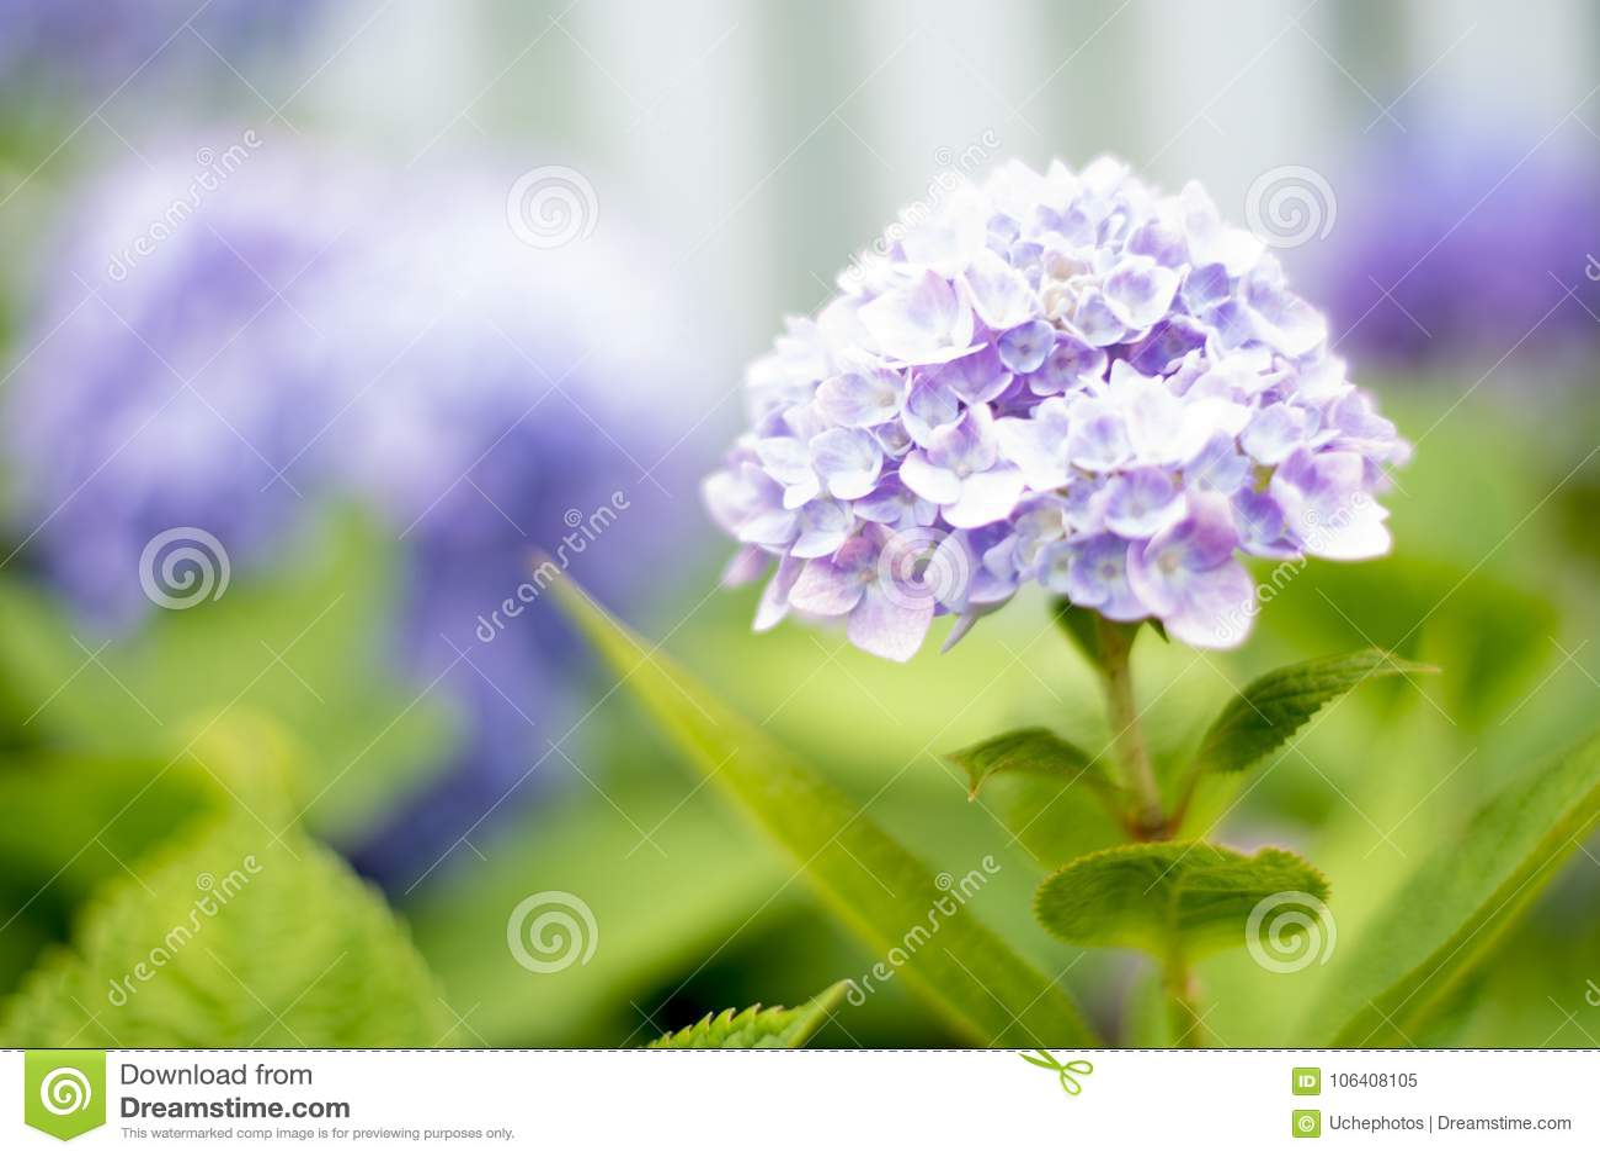 A hydrangea flower is a poem